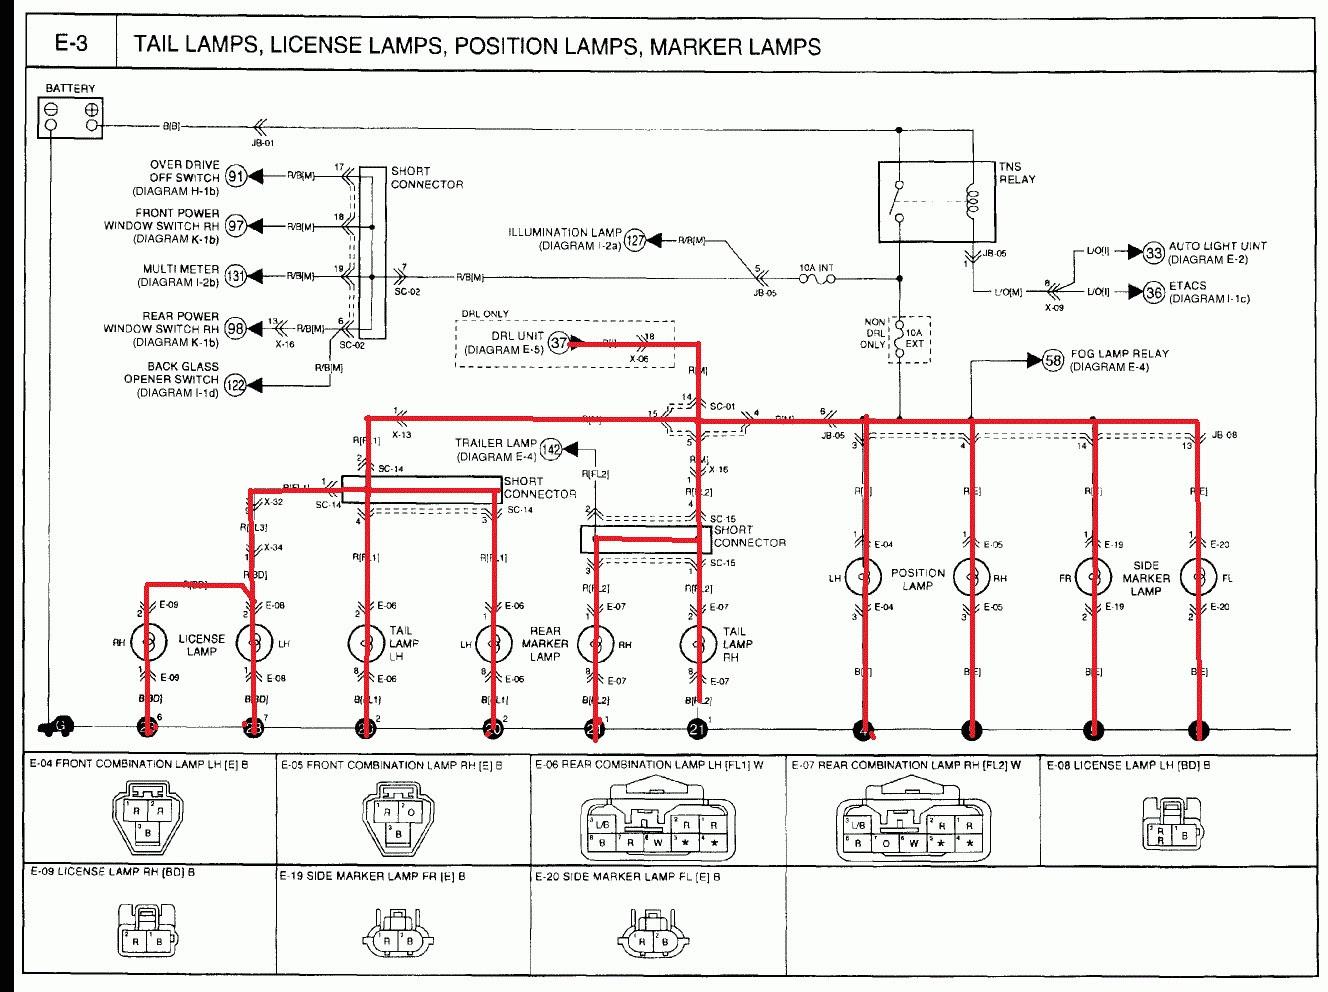 2002 Kia Spectra Fuse Box Diagram